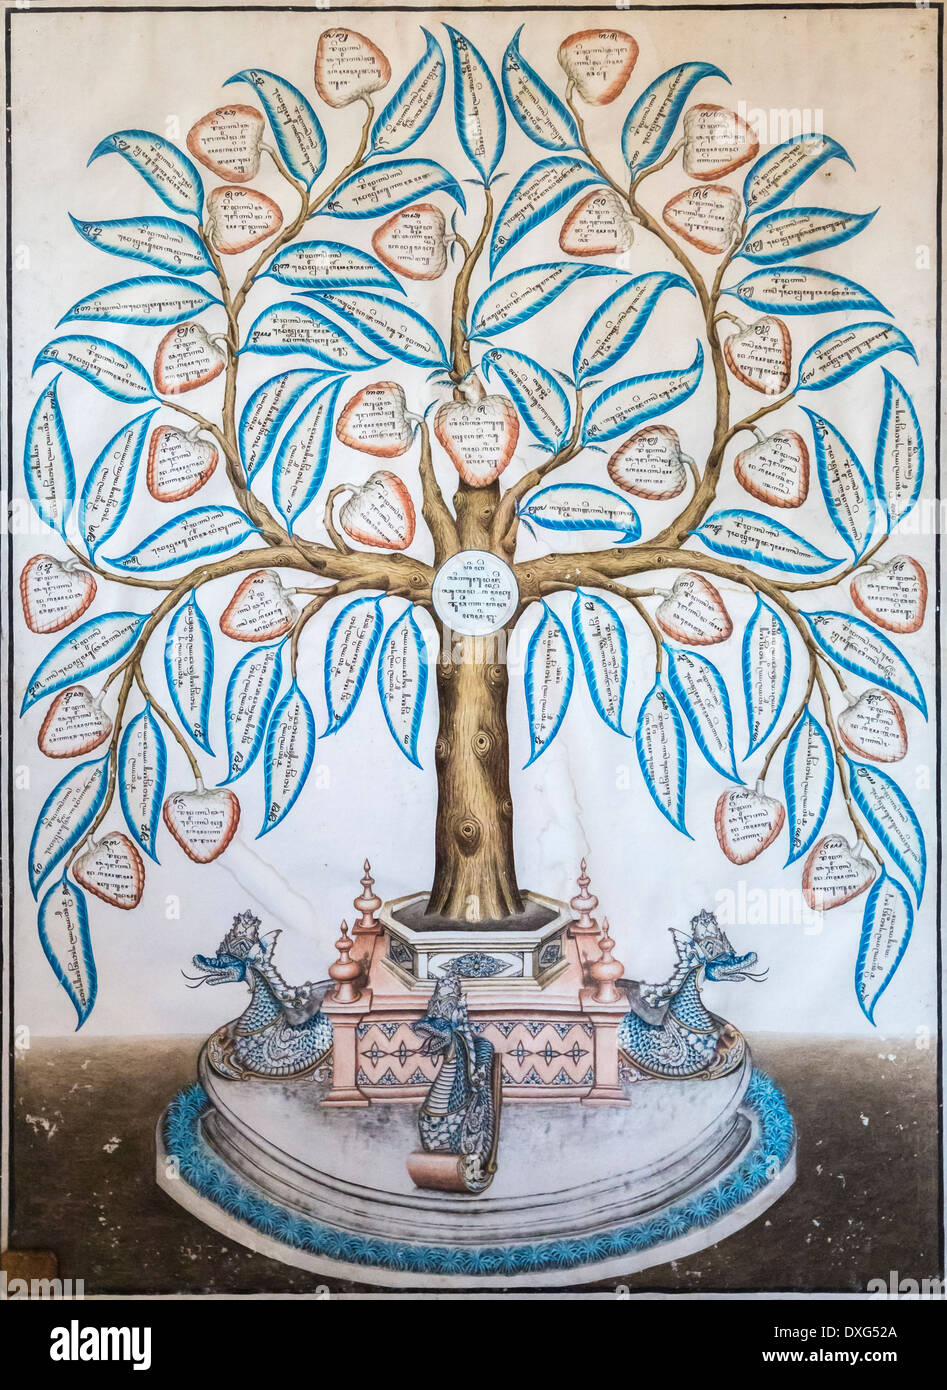 Genealogy or family tree of the sultanate of Yogyakarta, Java, Indonesia. Hamengku Buwono is the current ruling royal house. - Stock Image